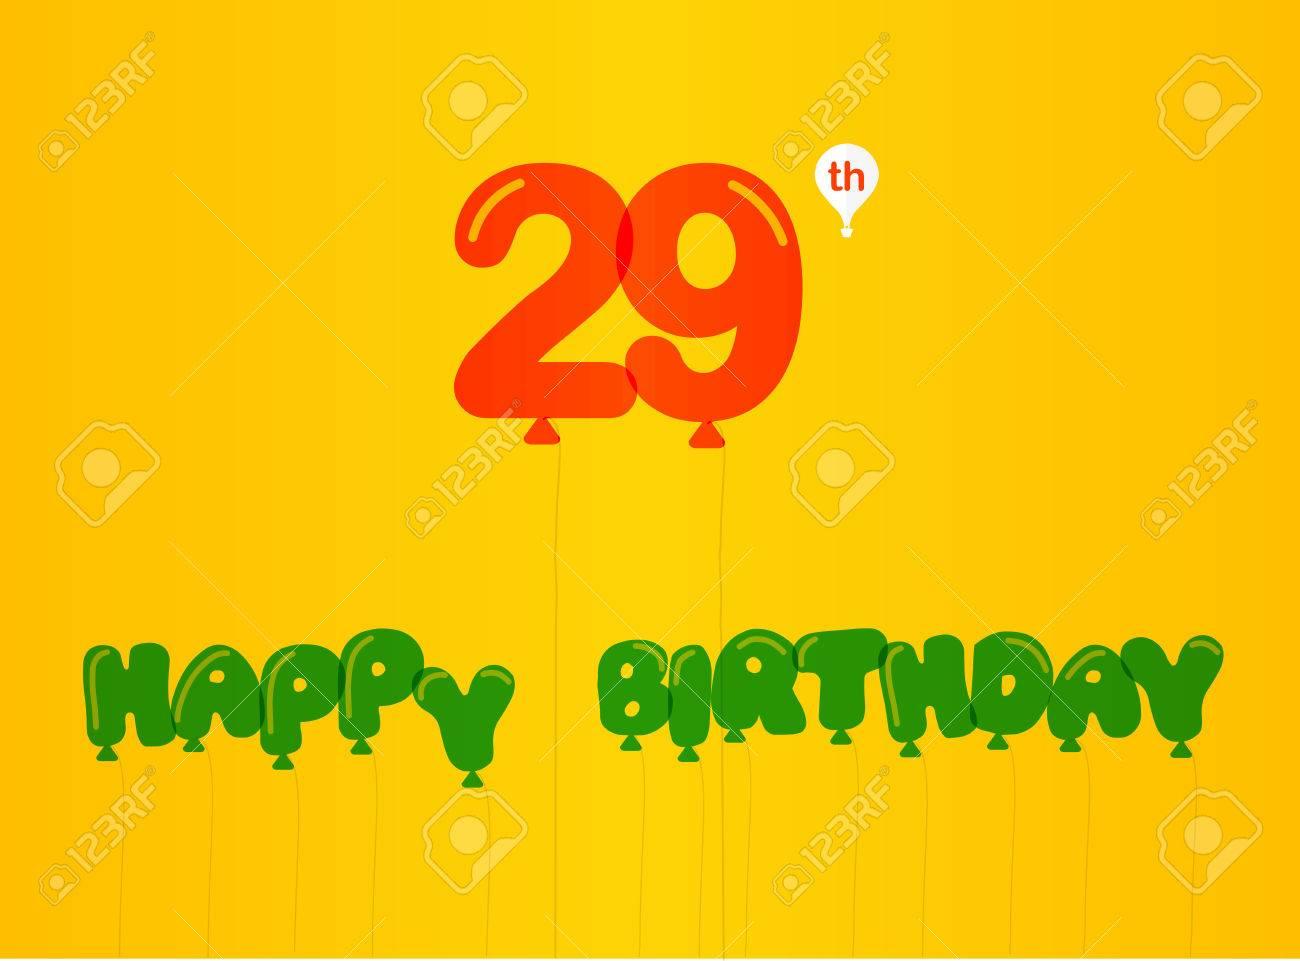 29 Year Birthday Celebration Flat Color 29th Anniversary Decorative